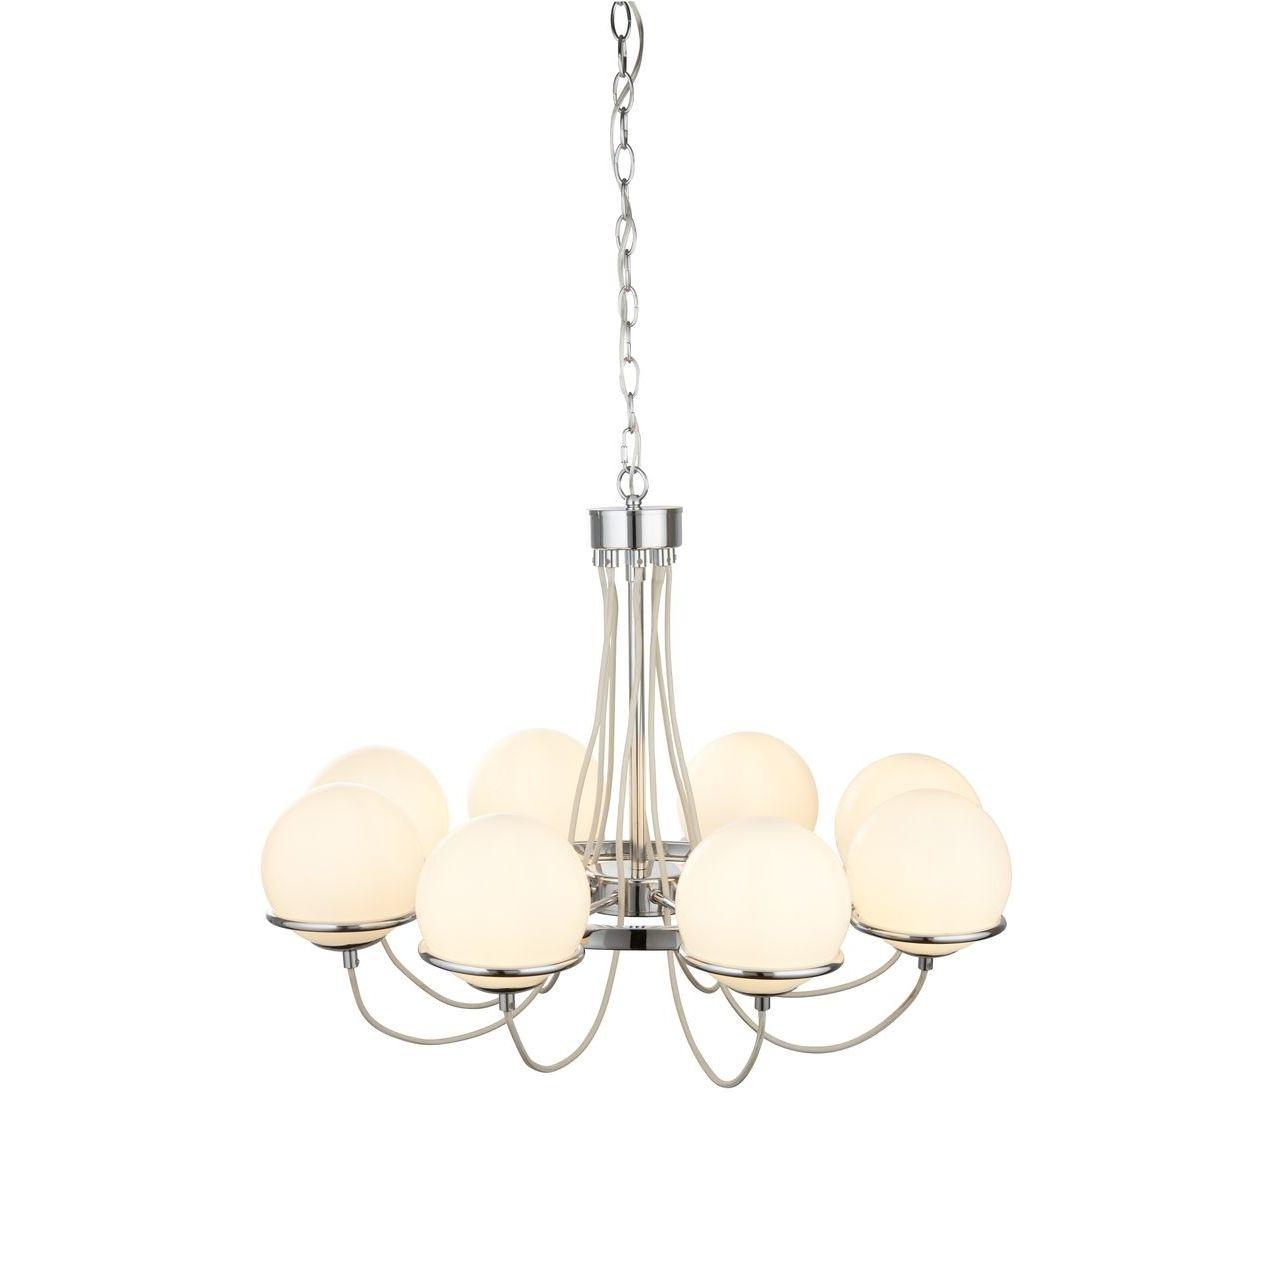 A2990LM-8CC Подвесная люстра Arte Lamp Bergamo